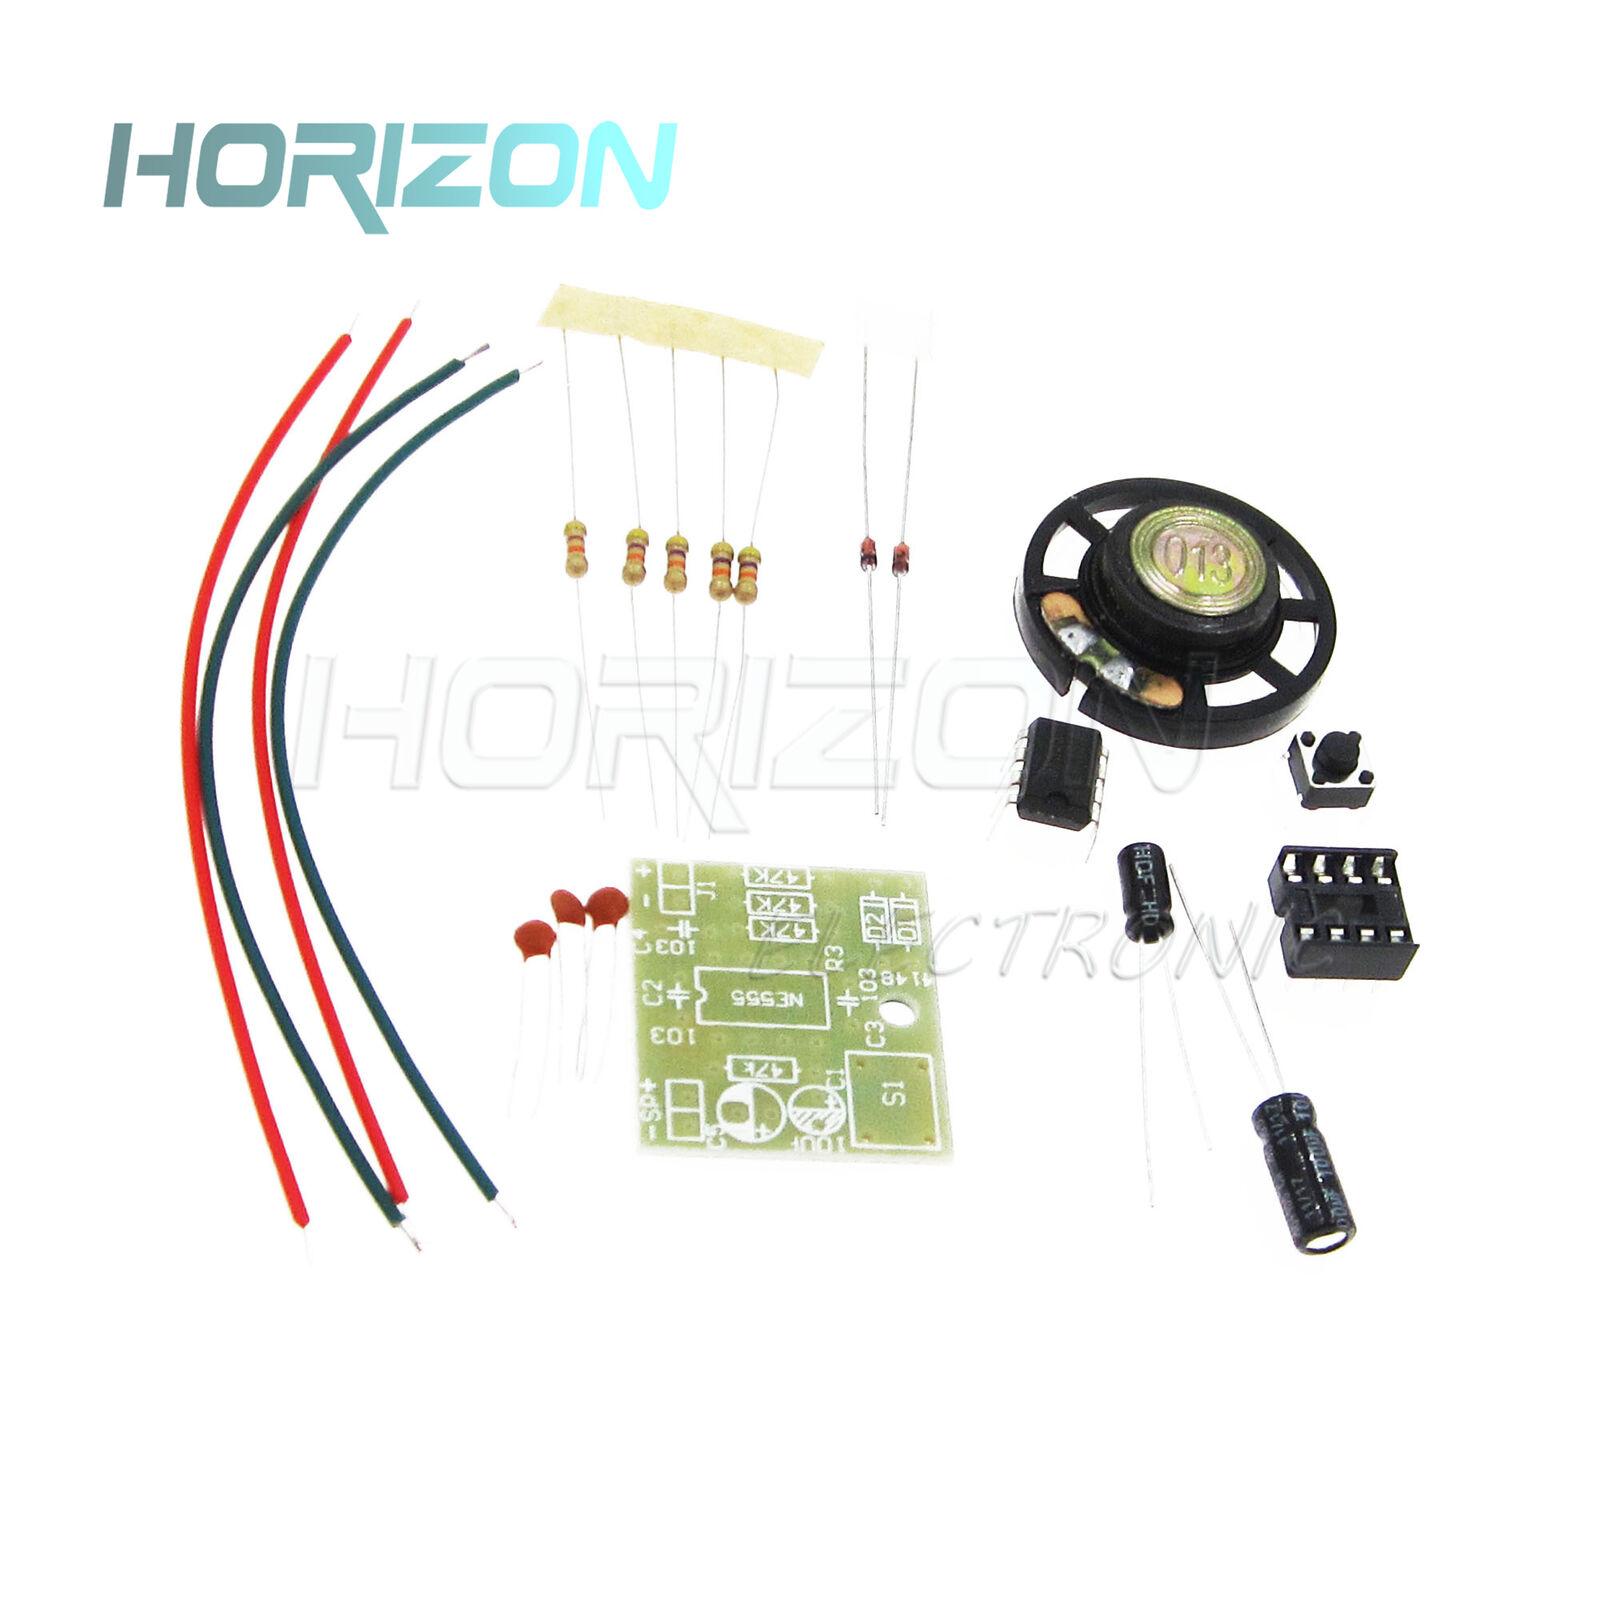 Doorbell Suite Electronic Production Door Bell Diy Kit Ne555 Chip Ebay Circuit Project Kits Module Board